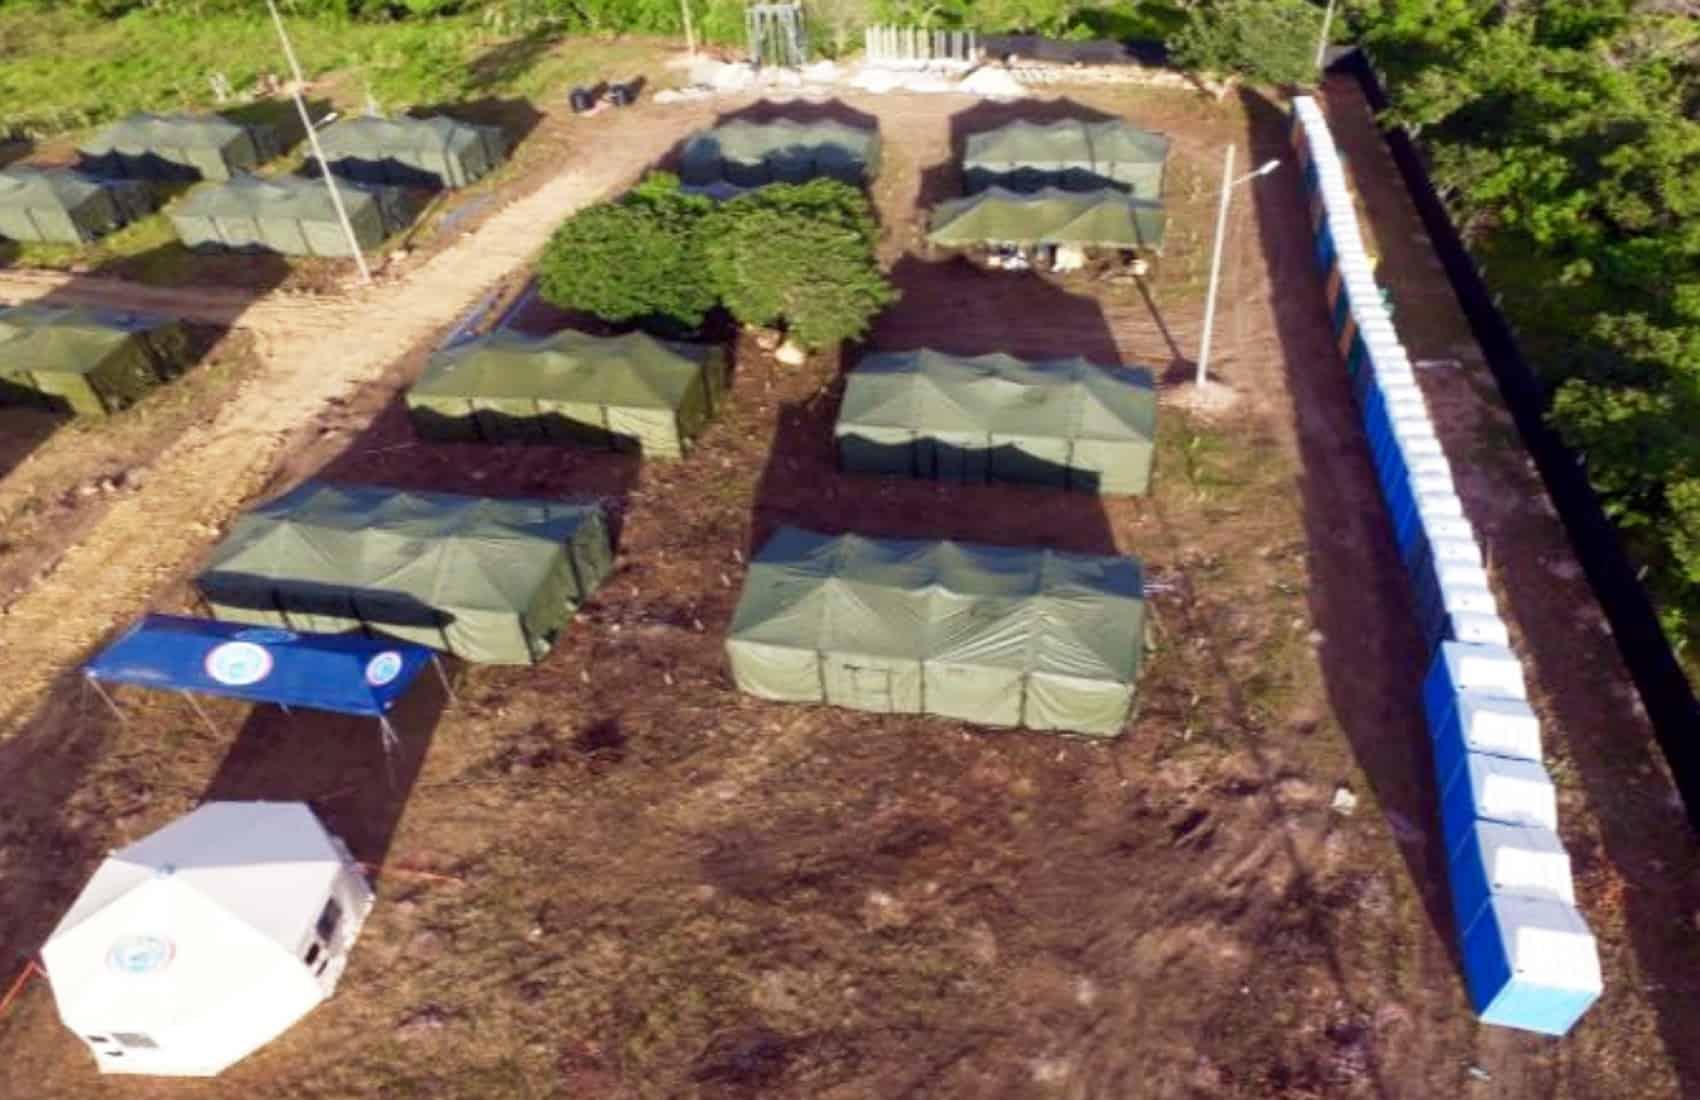 Migrants shelter in La Cruz, Guanacaste. Sept. 27 2016.